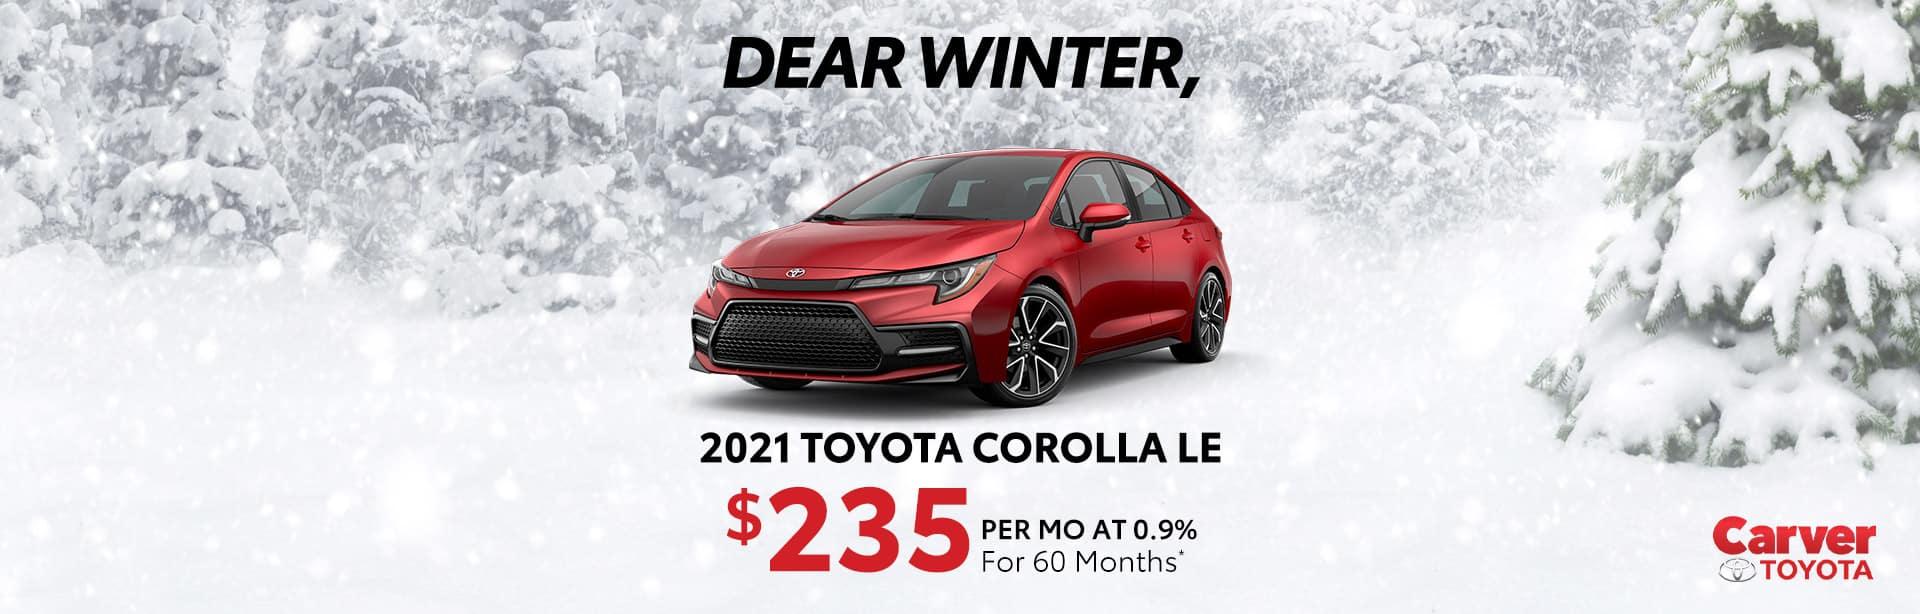 Big savings on a new 2021 Toyota Corolla near Taylorsville IN